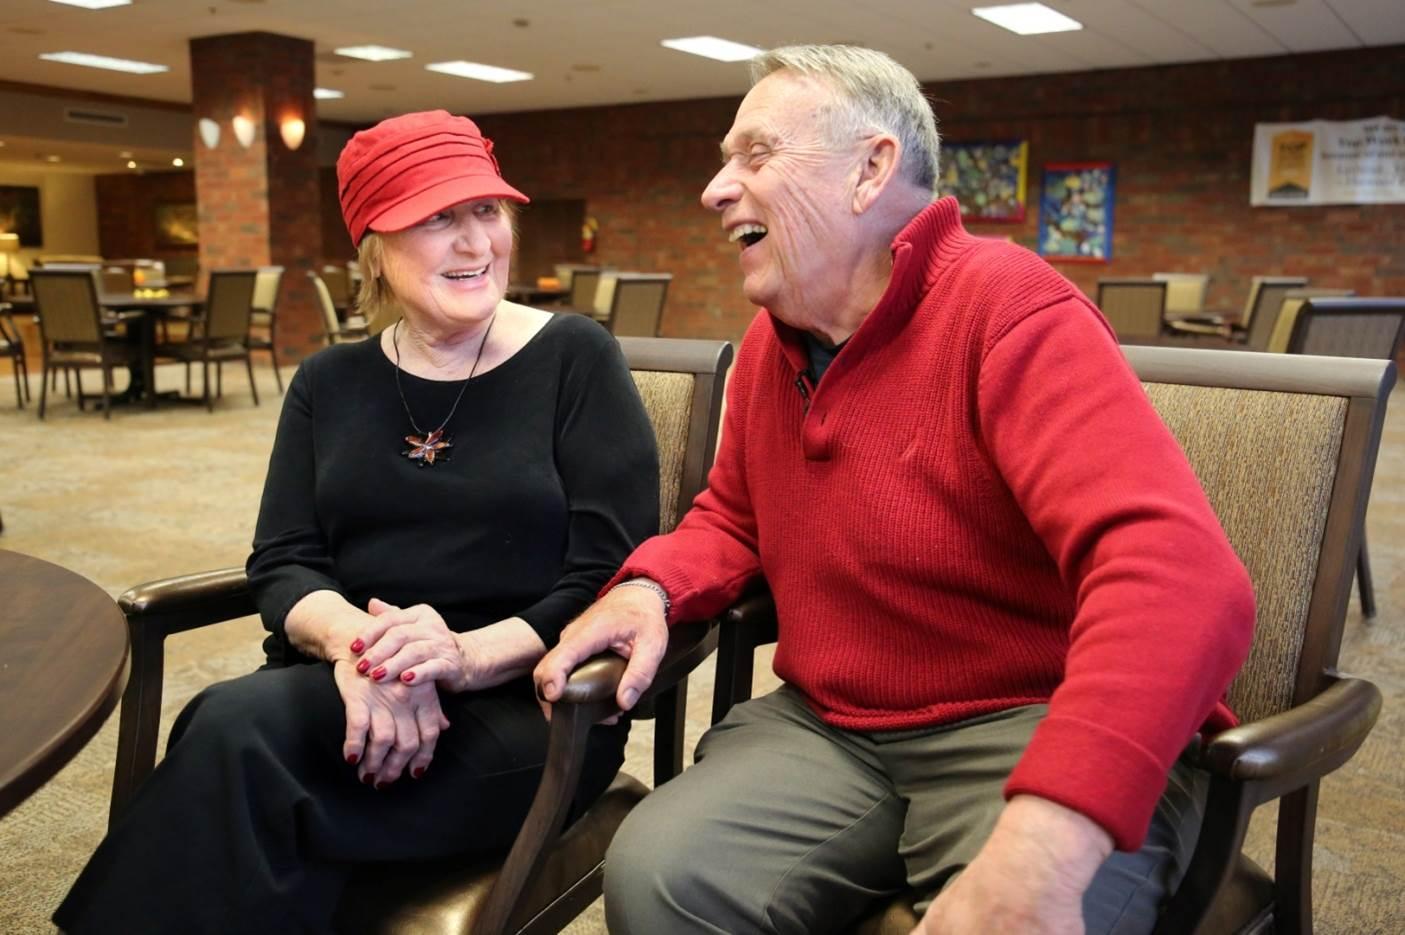 Elaine and Marty Schreiber. Photo courtesy of Martin Schreiber & Associates, Inc.